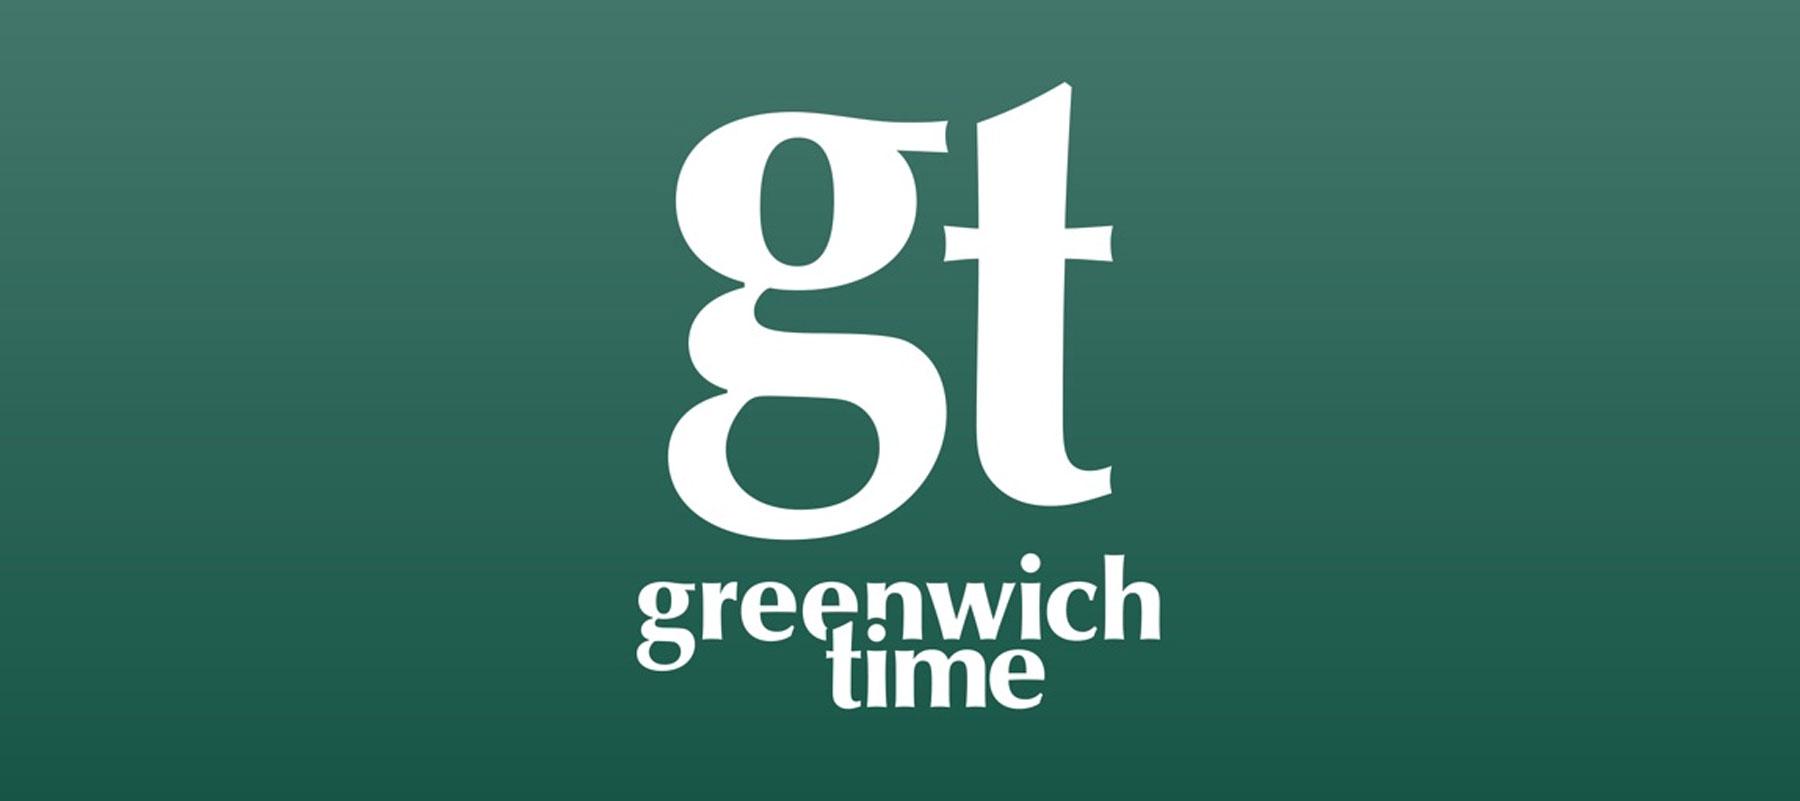 Greenwich Lighting Company Envisions Bright Future